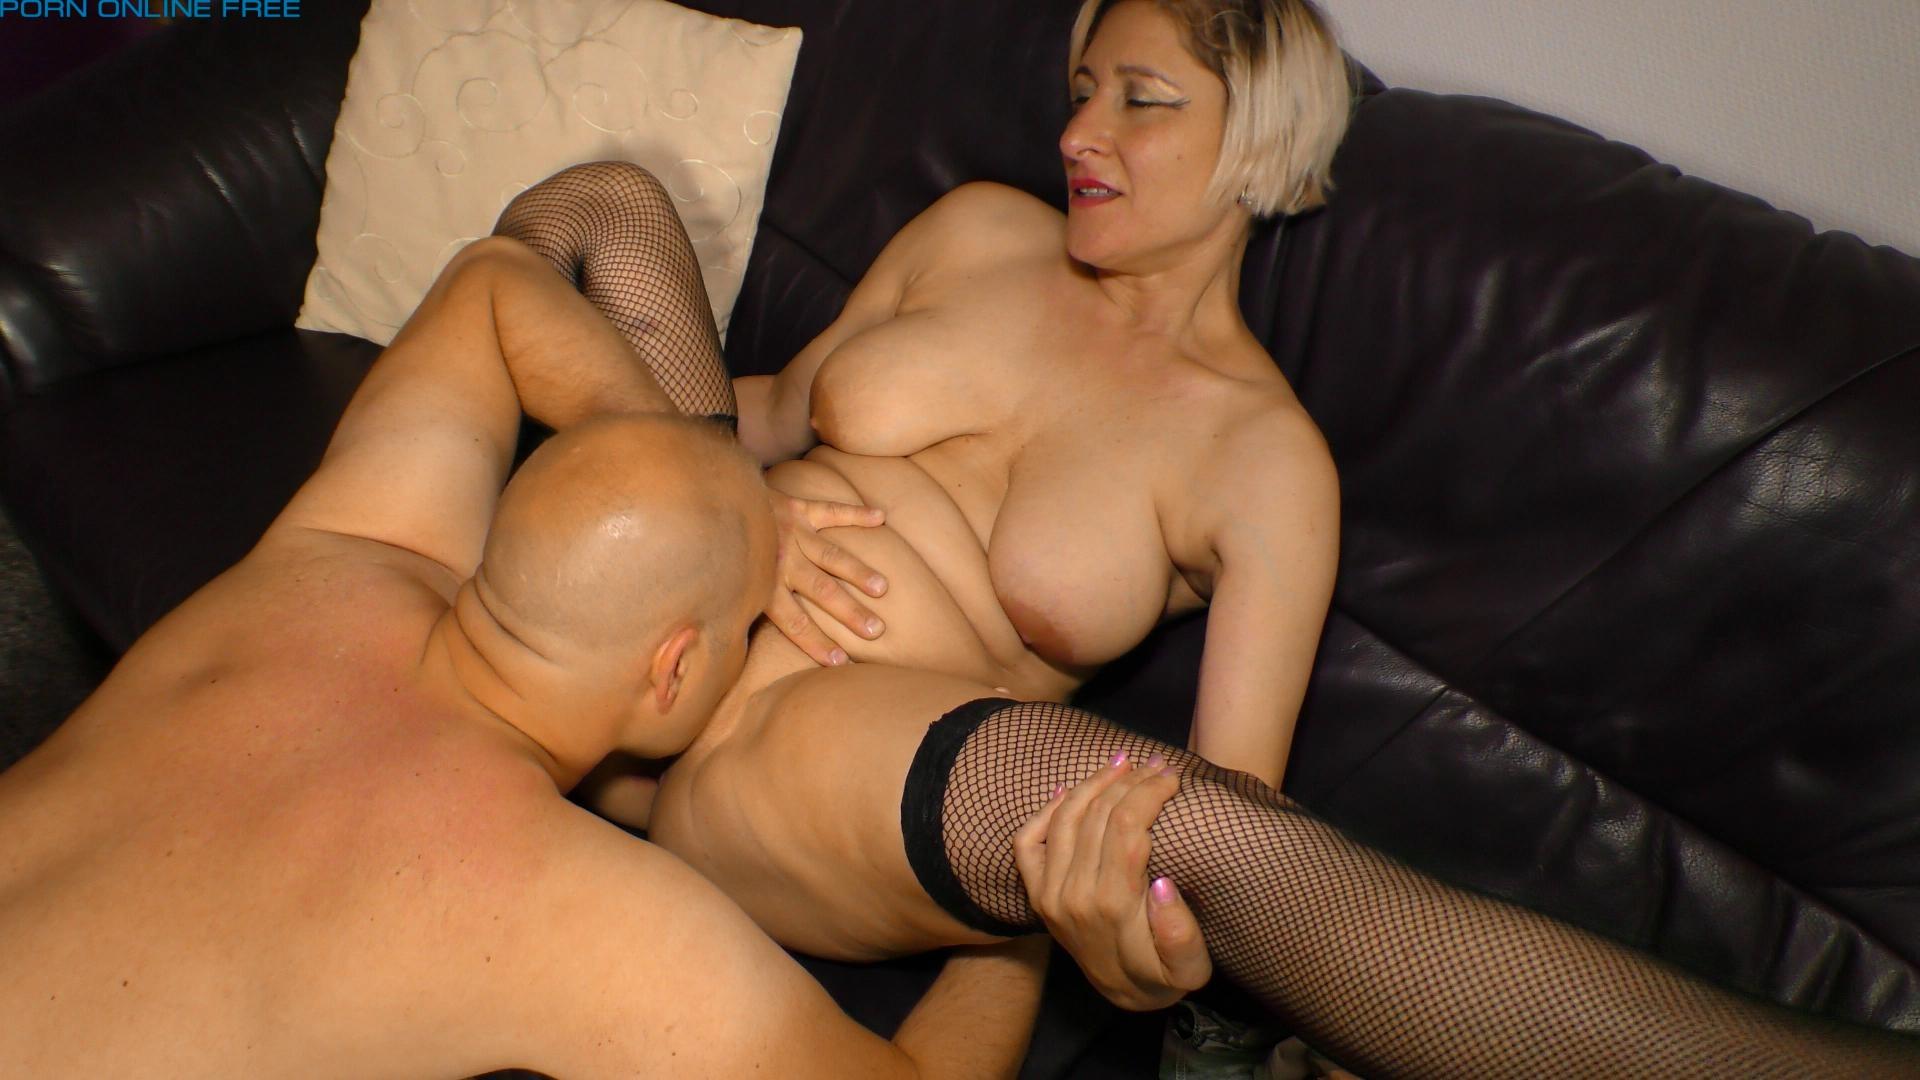 sandra bullock naked sex